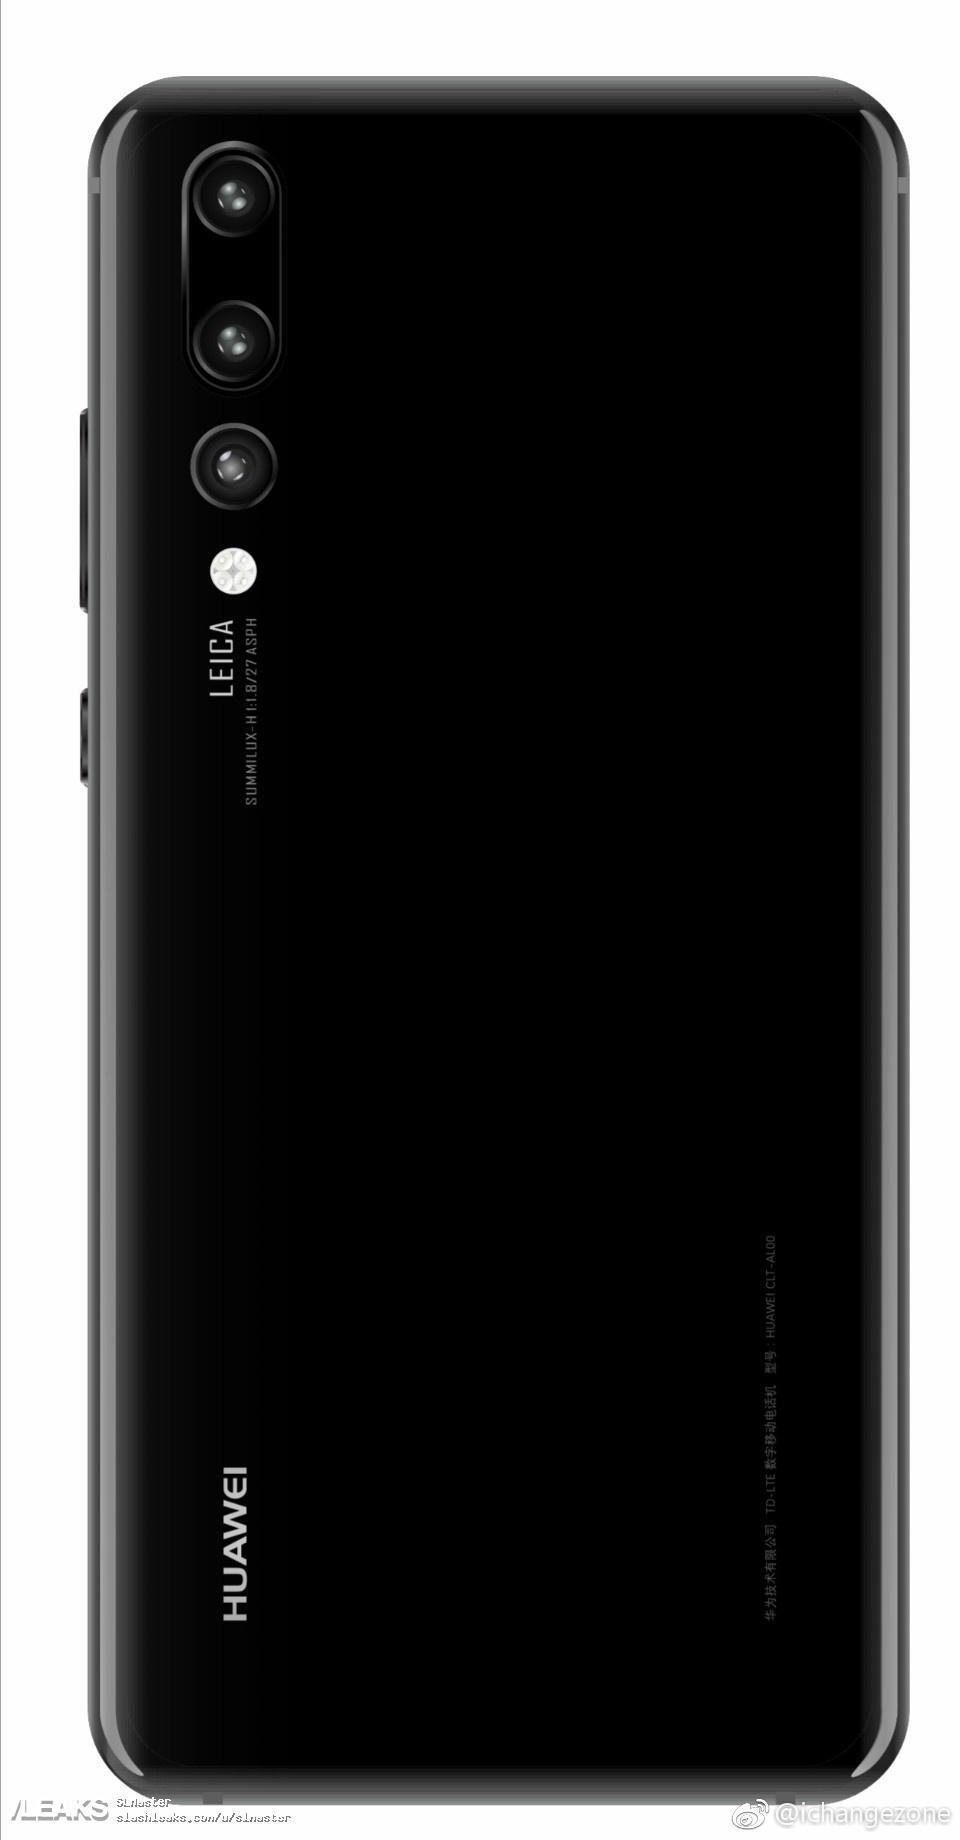 Huawei P20 Plus Back